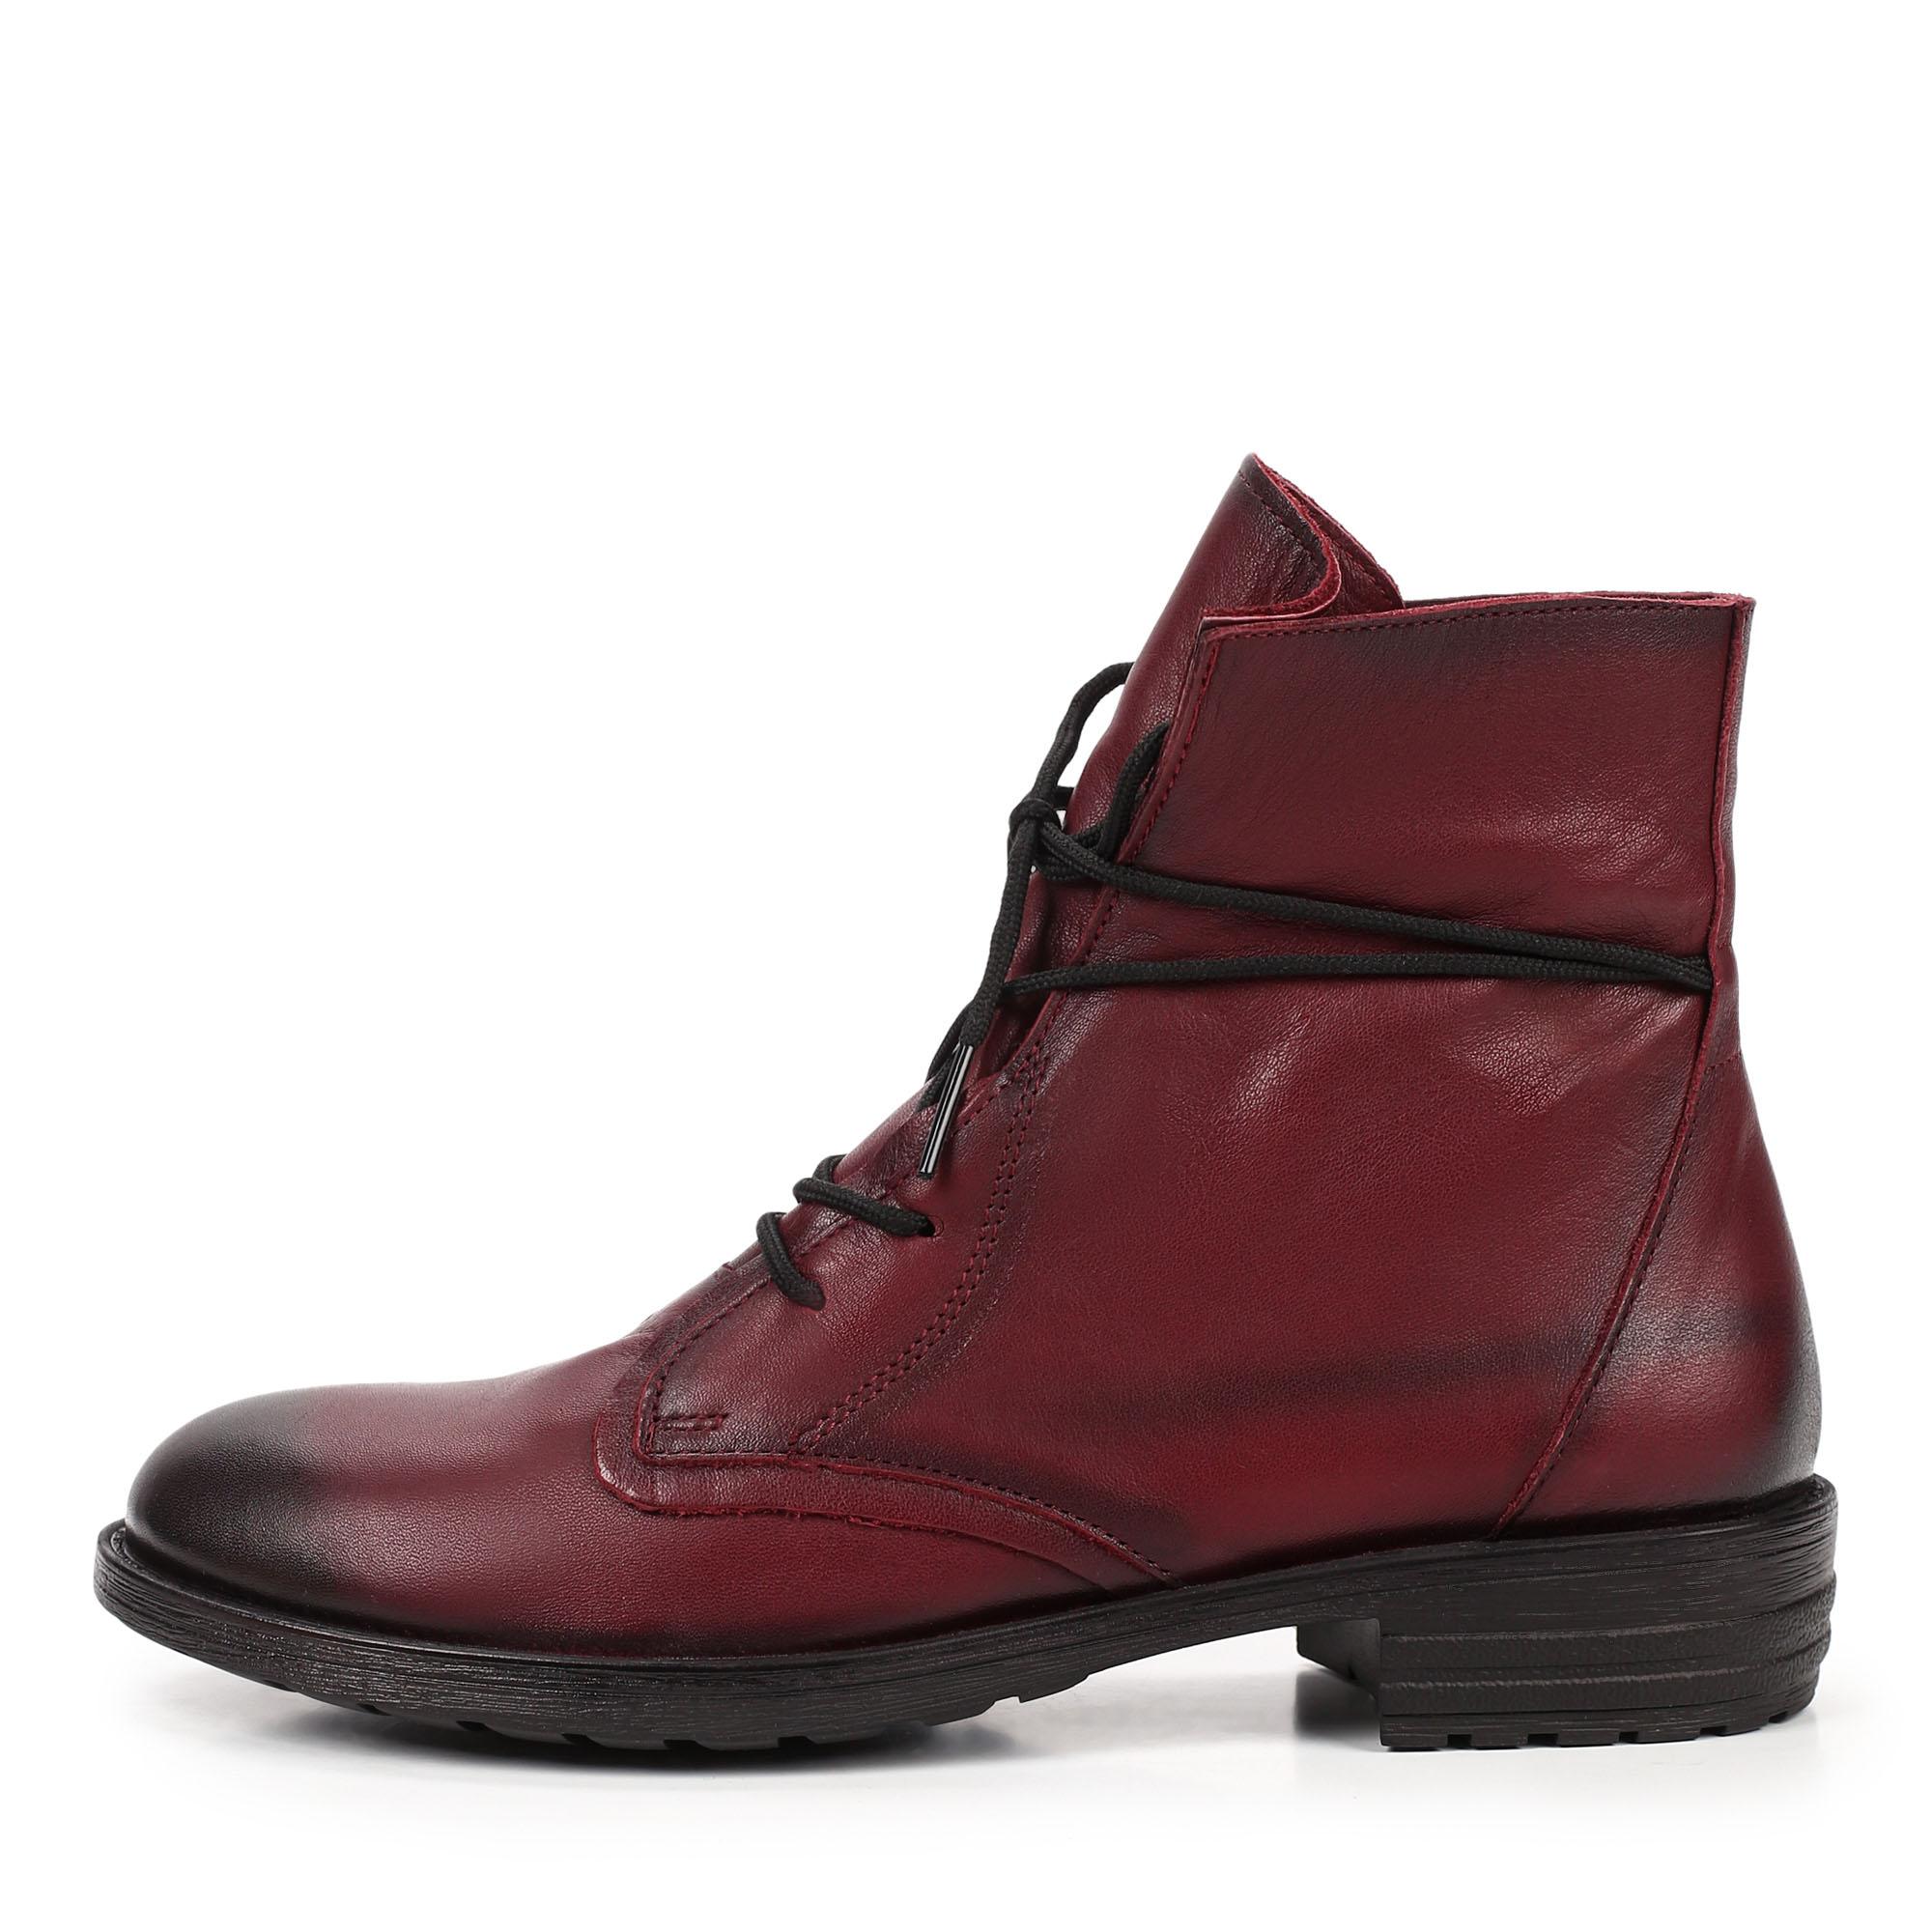 Ботинки Thomas Munz 539-013A-2105